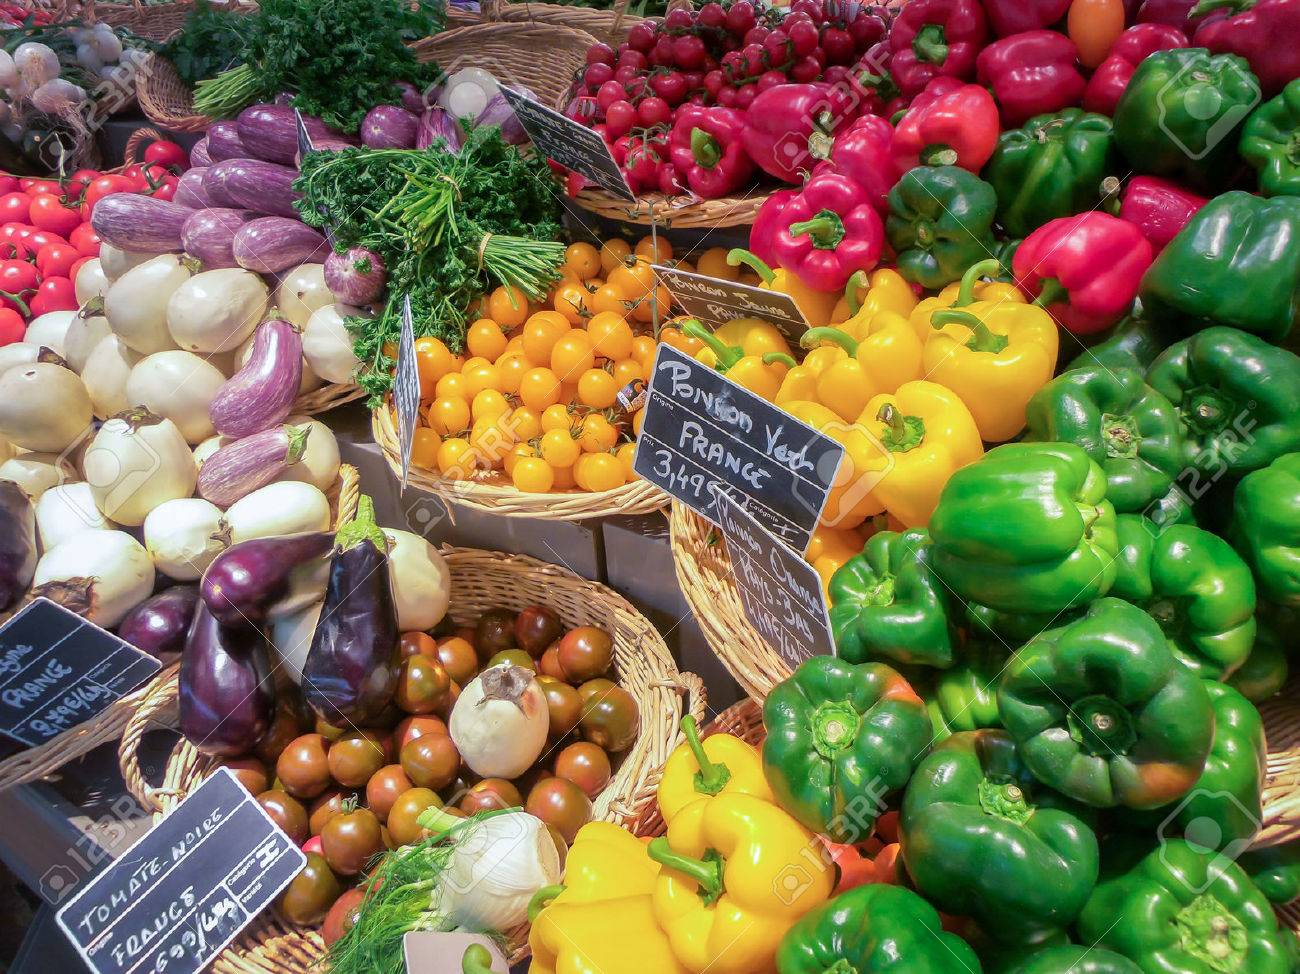 Fruit and vegetable market in France - 52534096